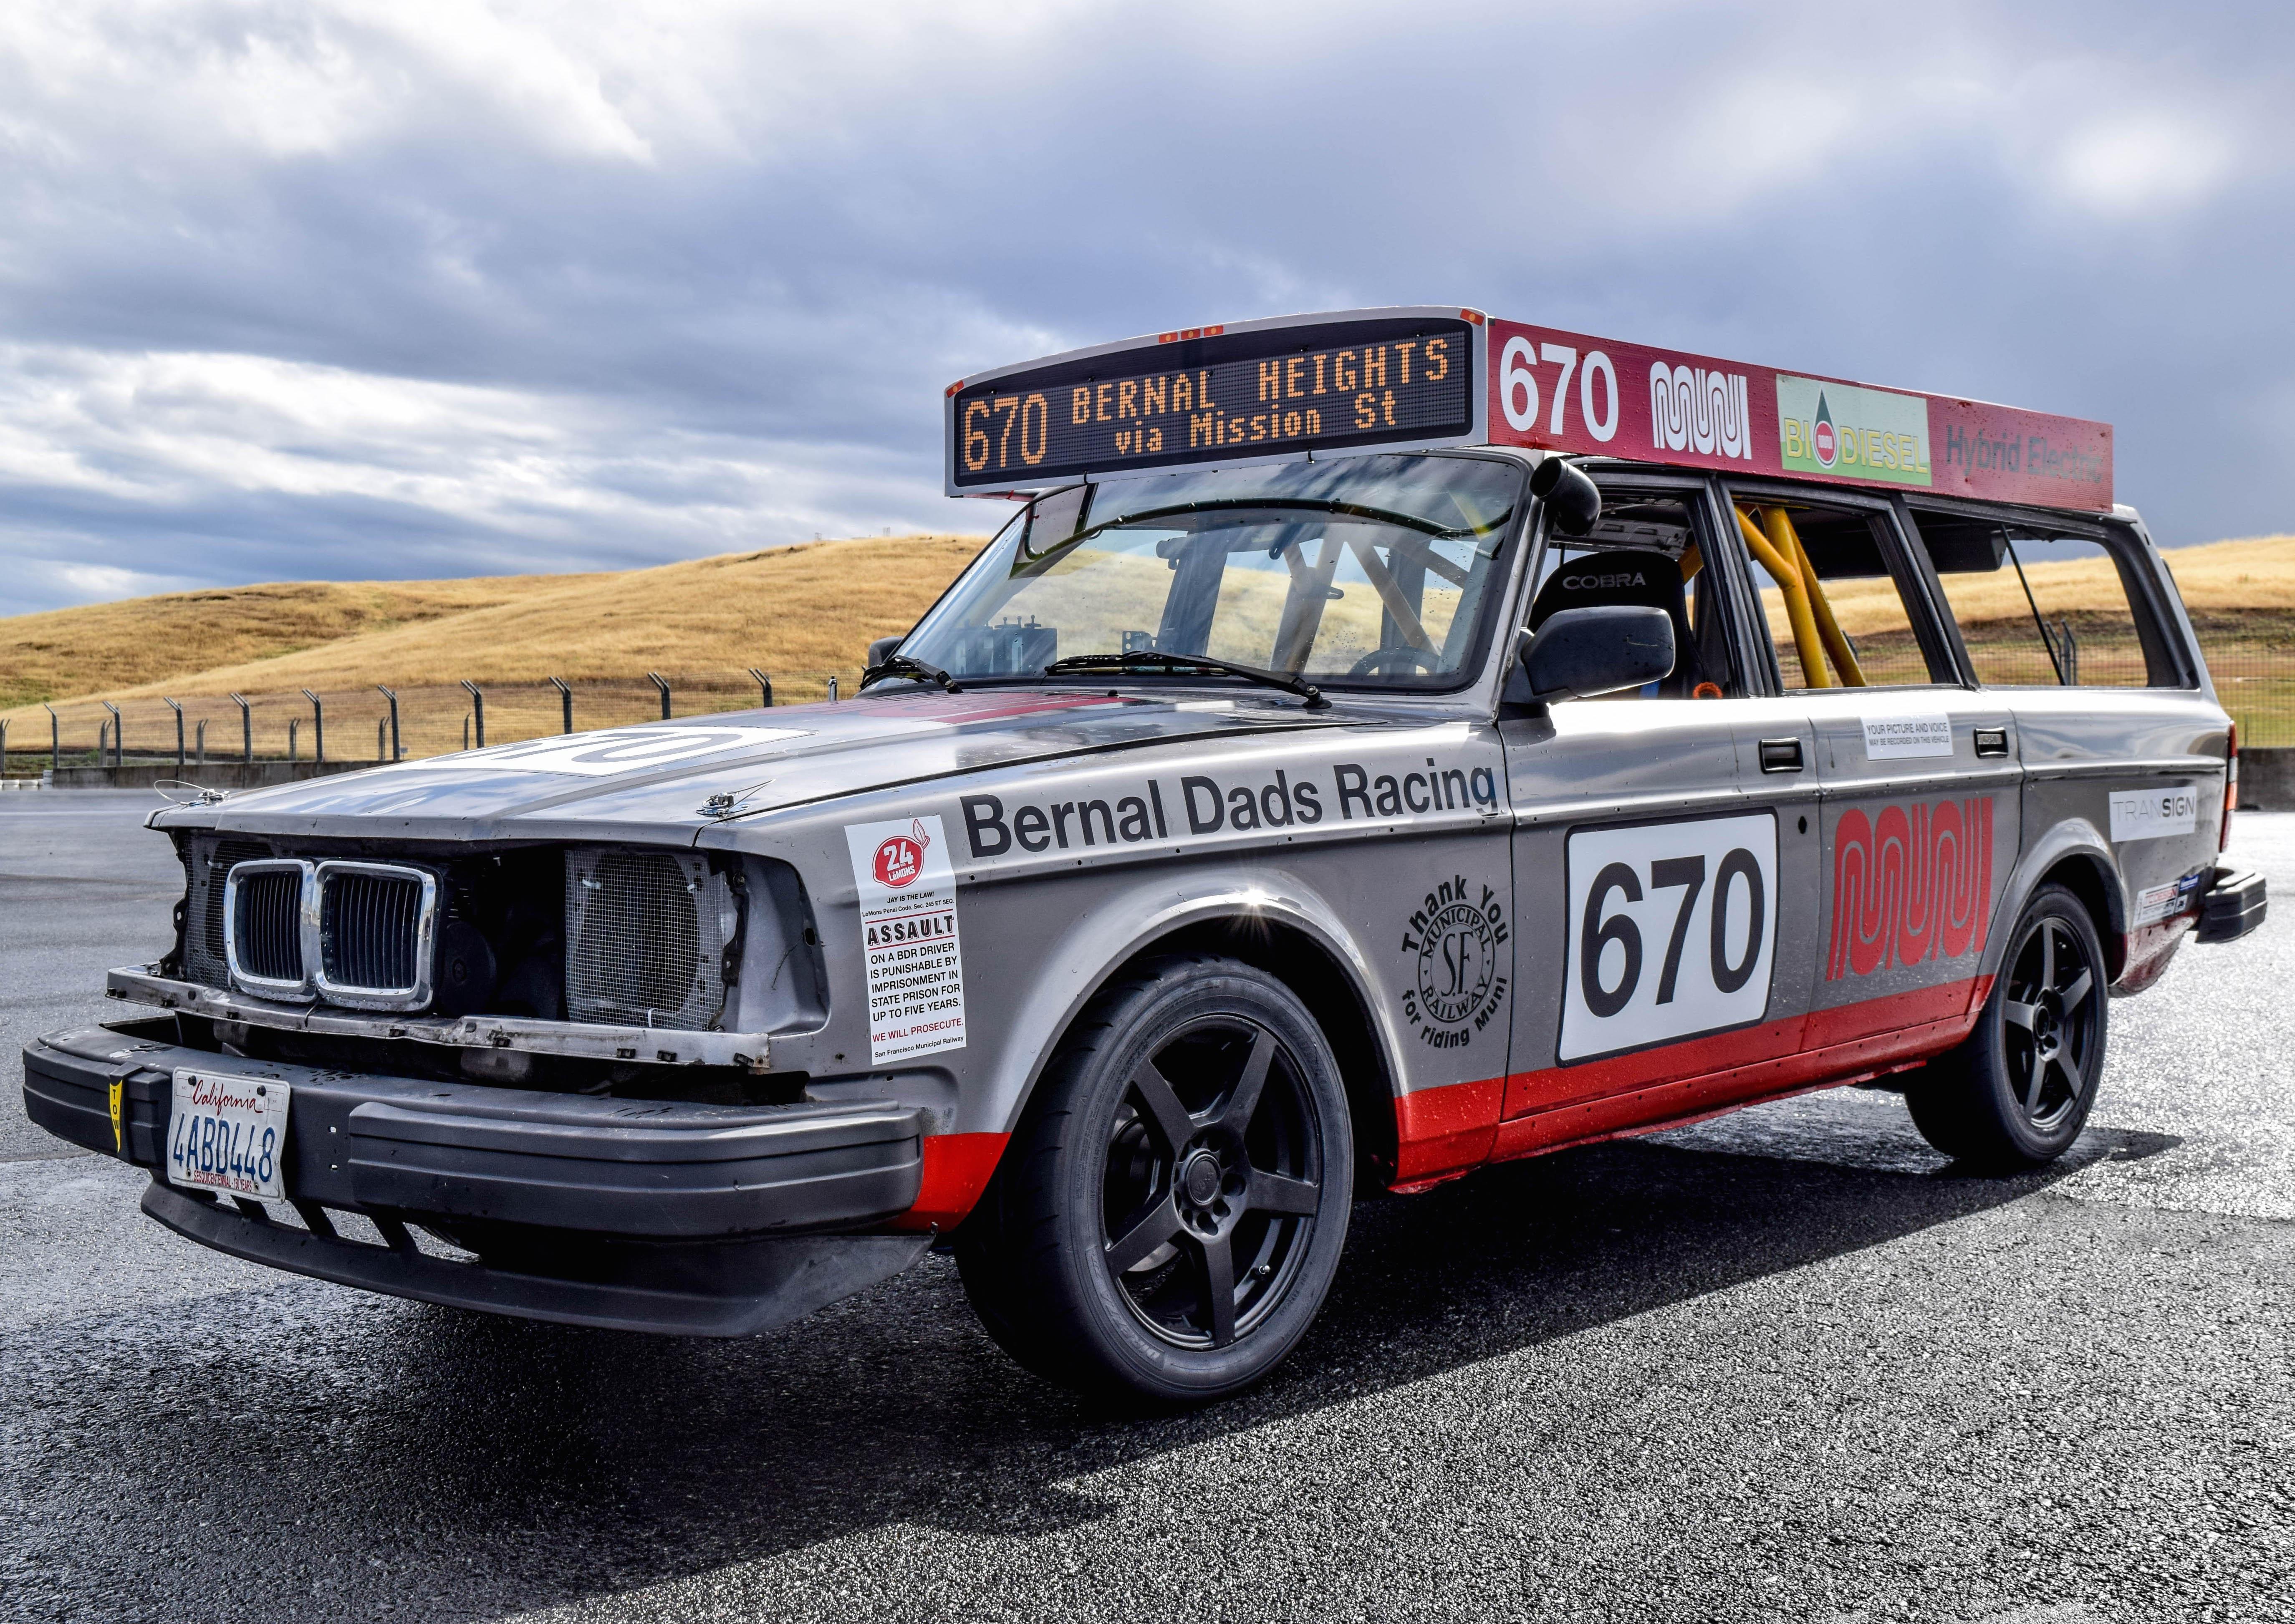 Bernal Dads Build Muni Race Car to Speed Up Public Transit